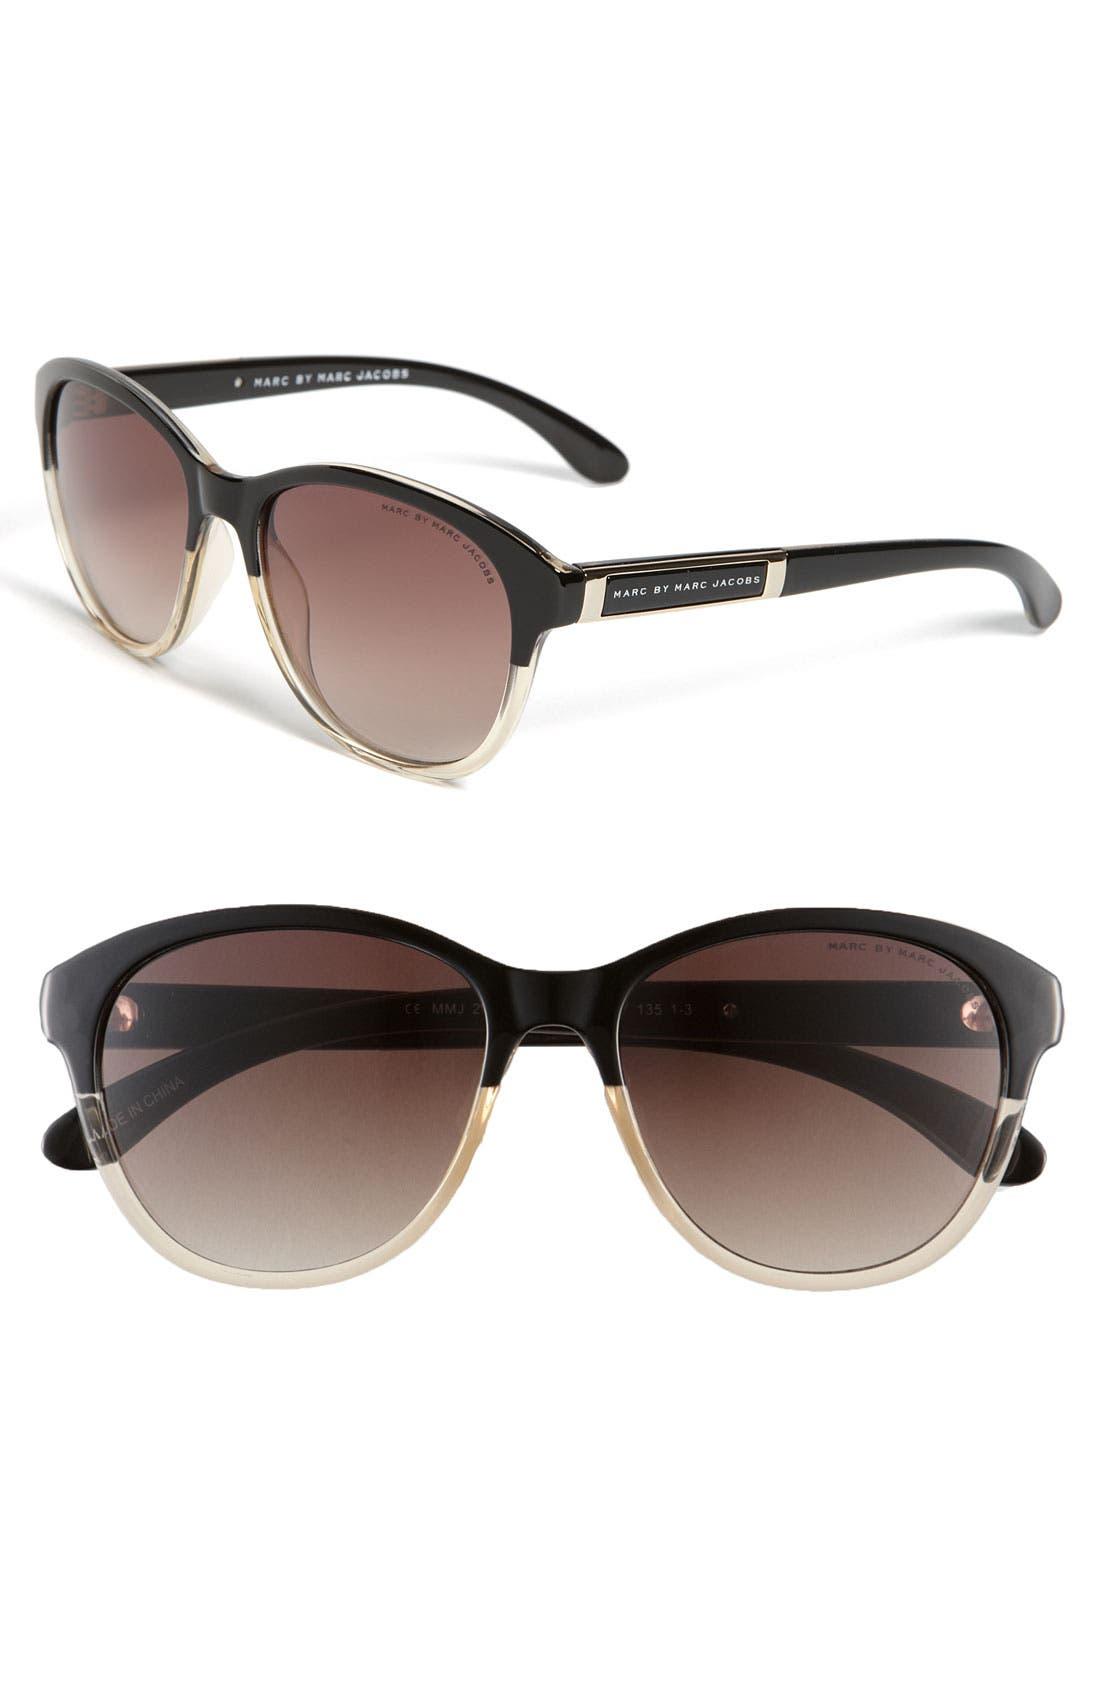 Main Image - MARC BY MARC JACOBS Retro Plastic Sunglasses